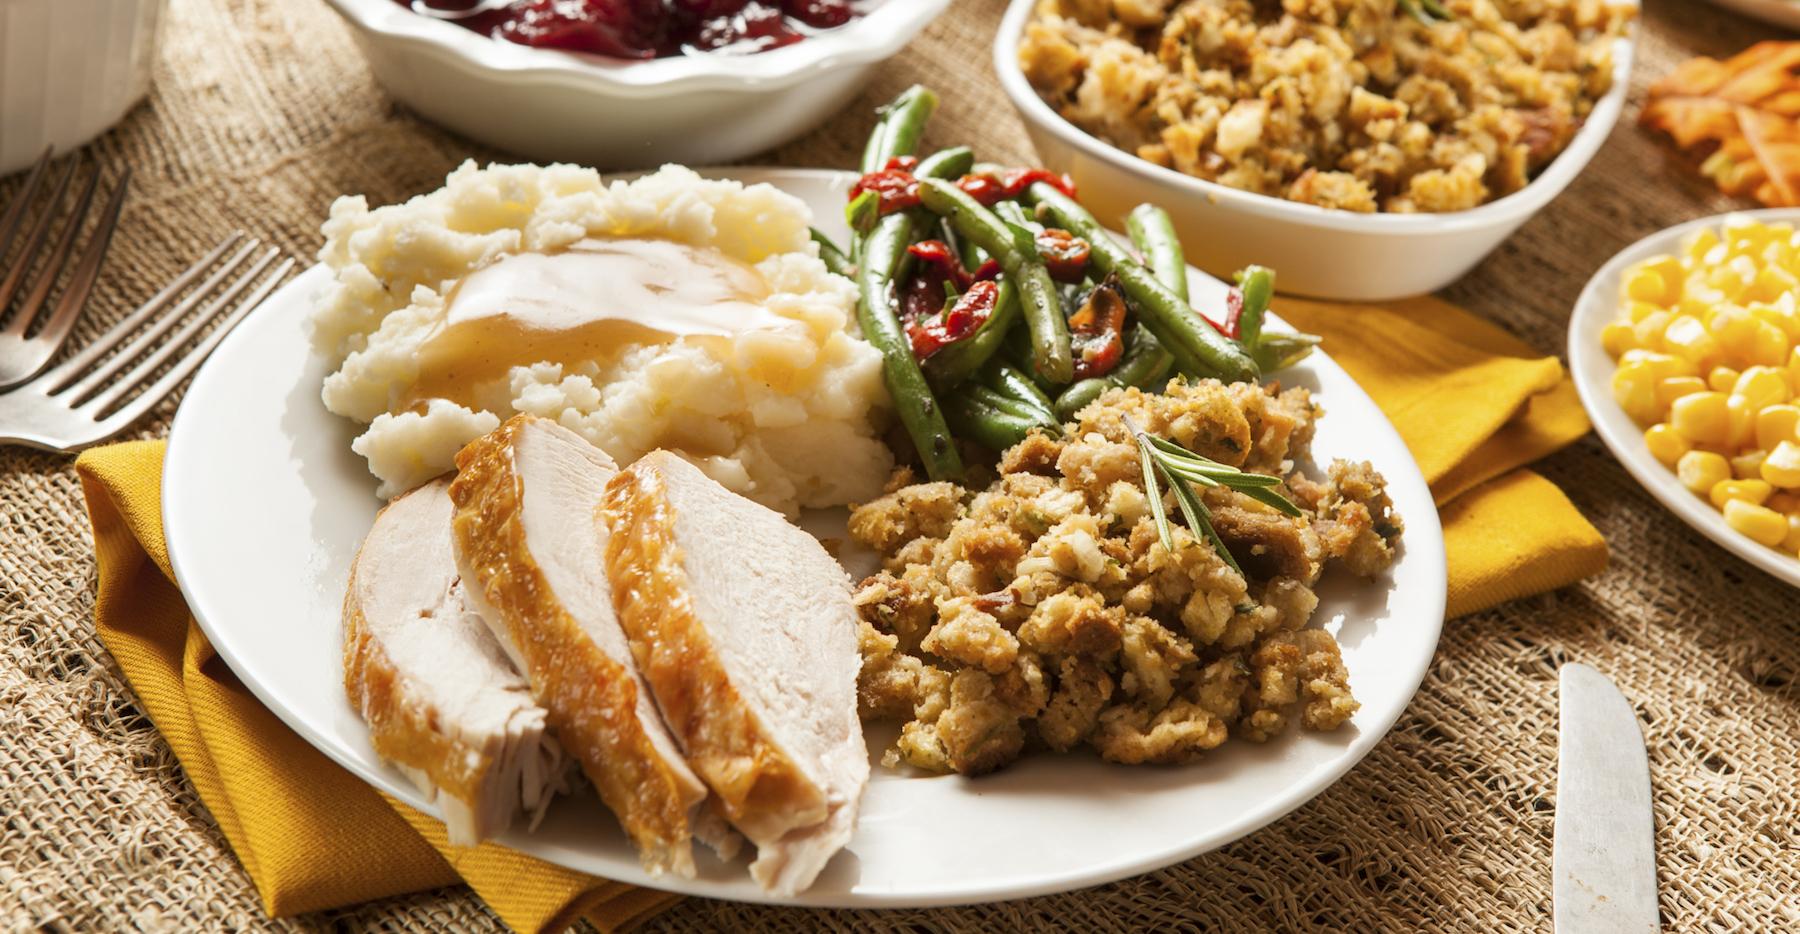 Thanksgiving Dinner: 5 Easy Ways to SaveCalories foto